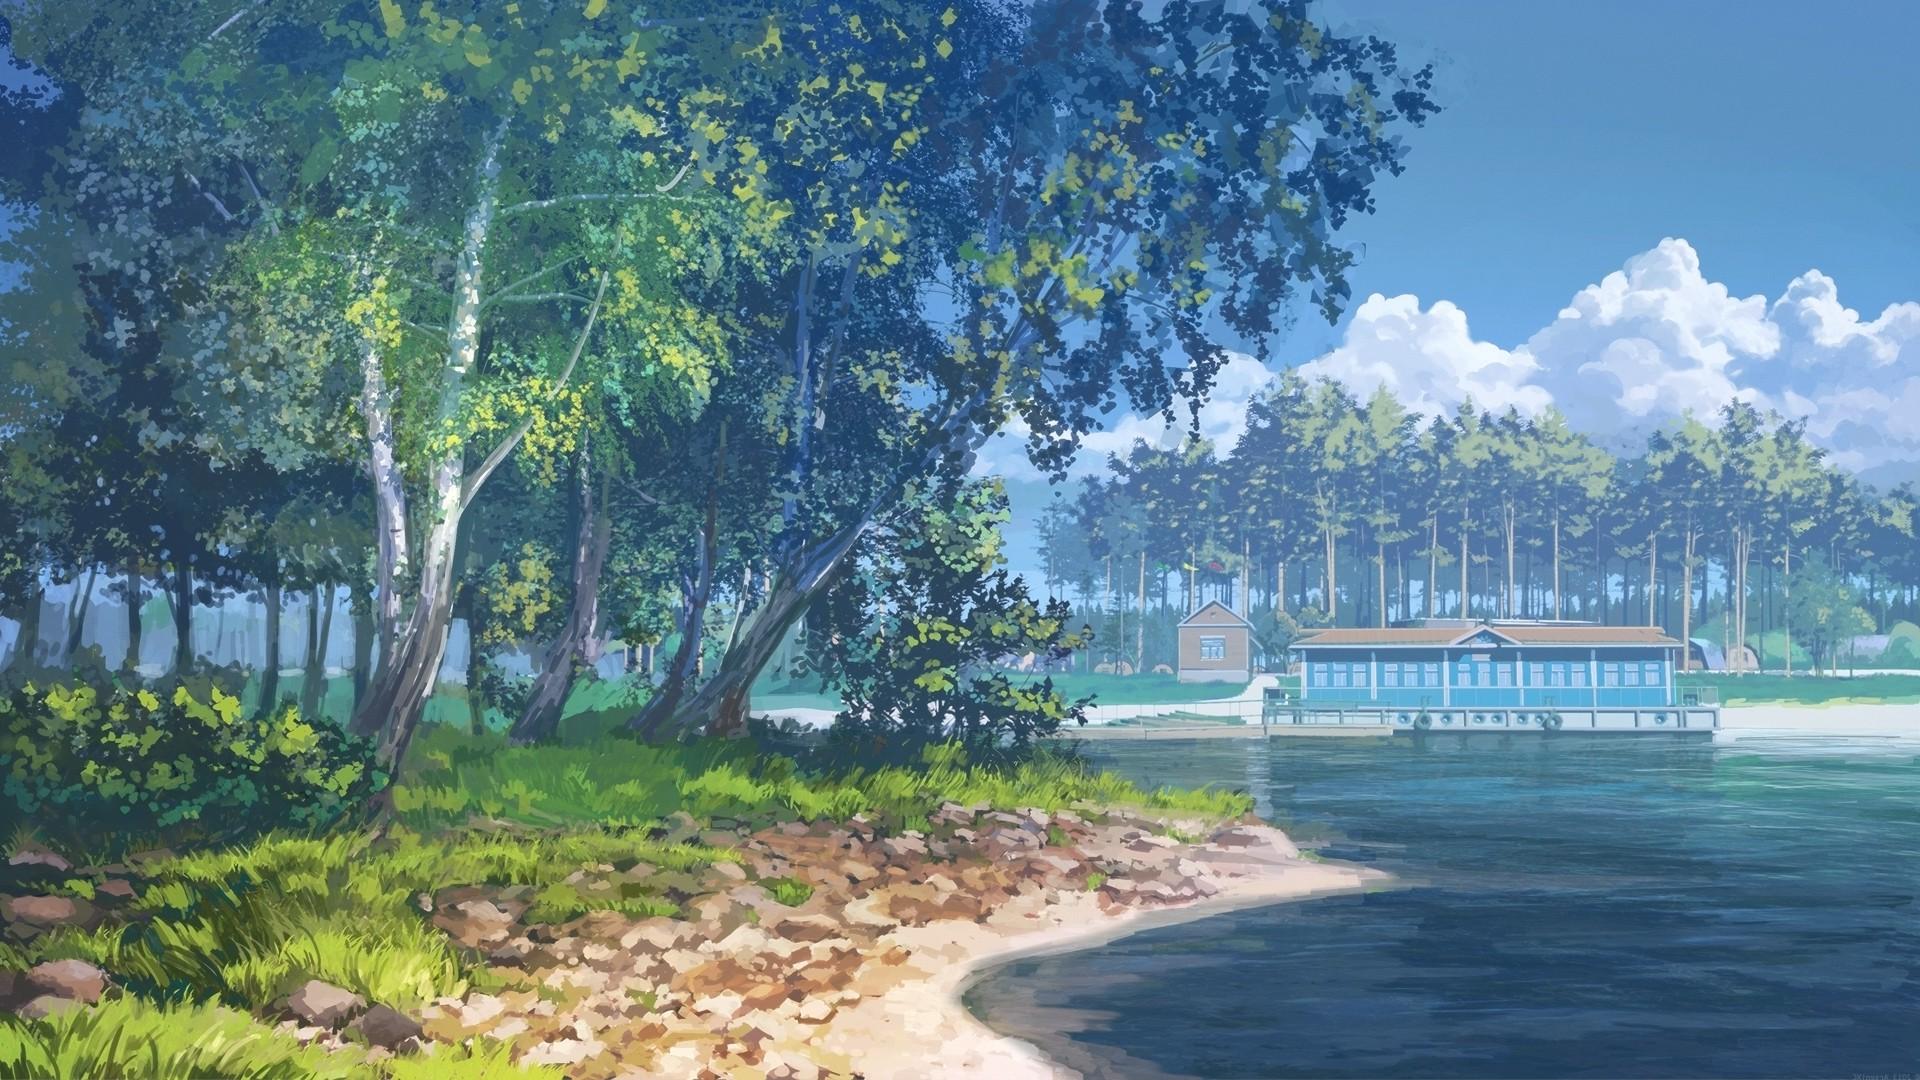 Landscape Bay Anime Lake Water Nature Shore Reflection Sky River Bank Reserve Wetland Tree Plant